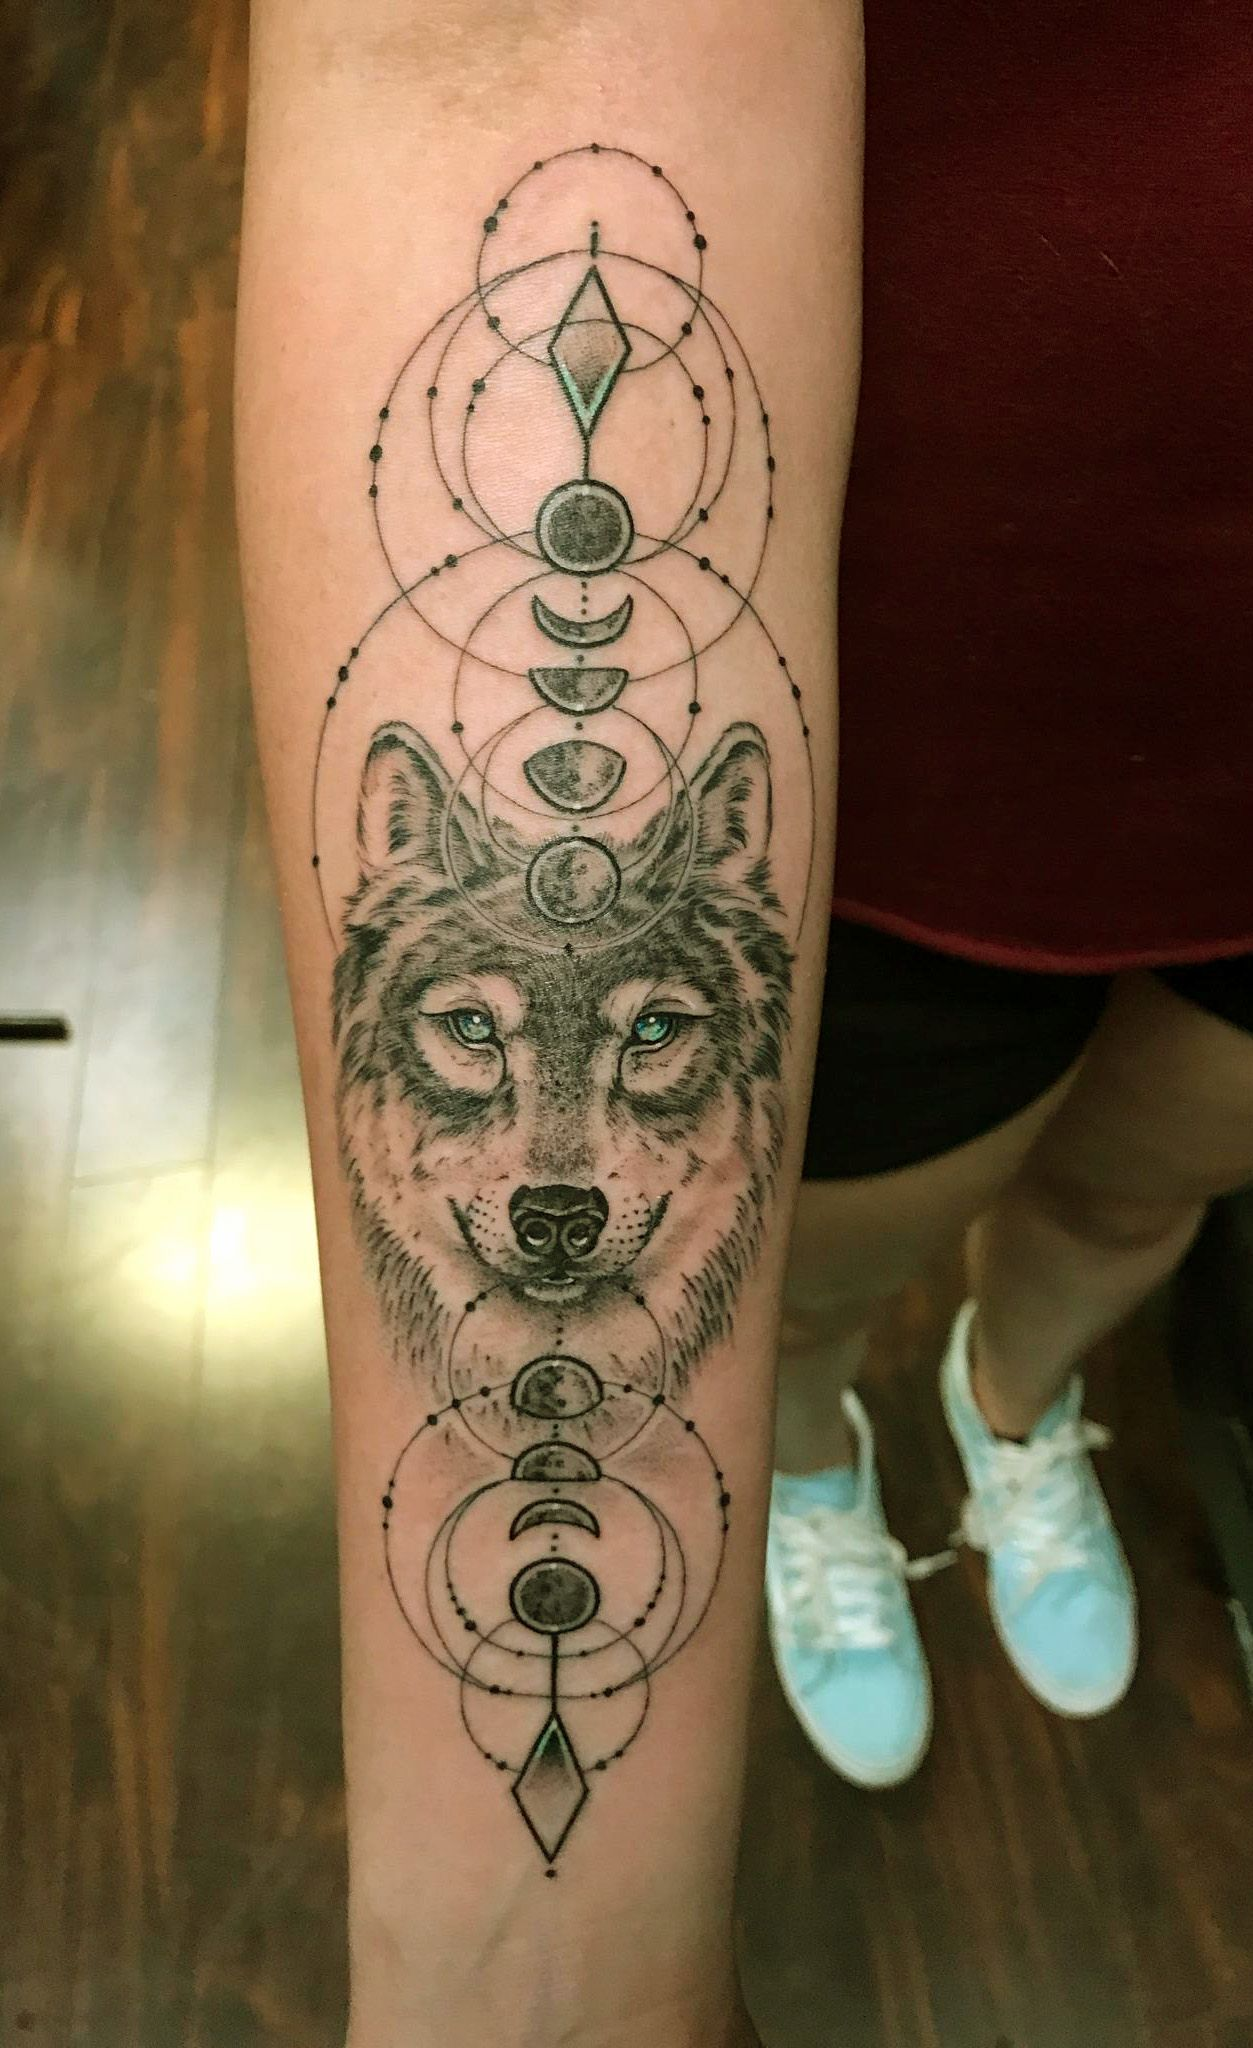 Wolf Tattoo Done By Daniel Silva At The Rock Zone In Gilroy Ca Mystical Tattoos Tattoos Wolf Tattoo